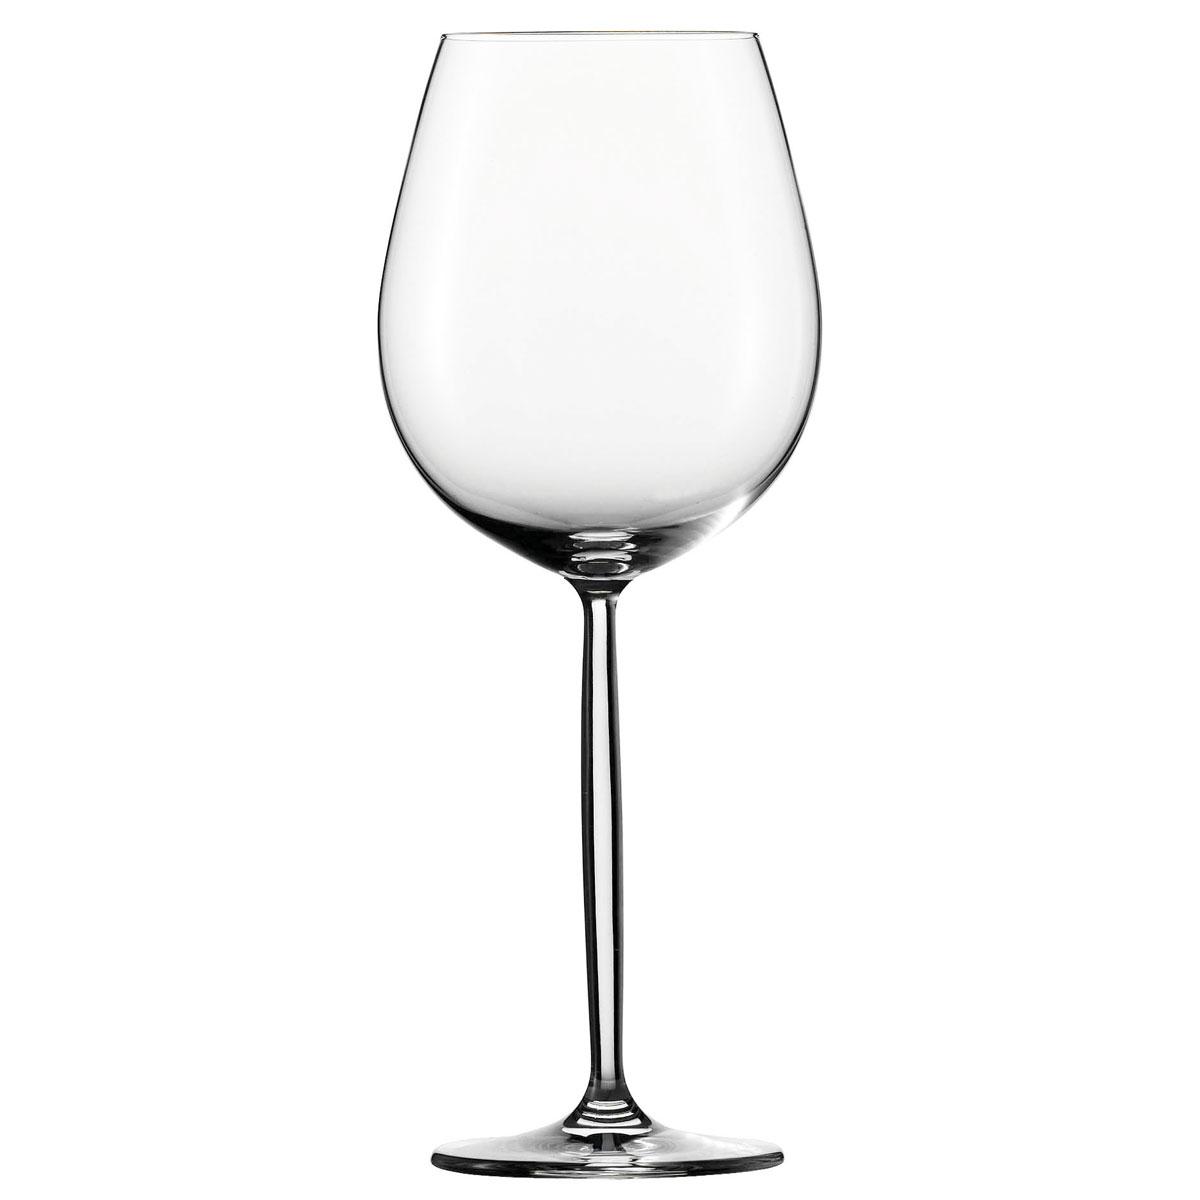 Schott Zwiesel Tritan Crystal, Diva Burgundy, Pinot Noir, Single